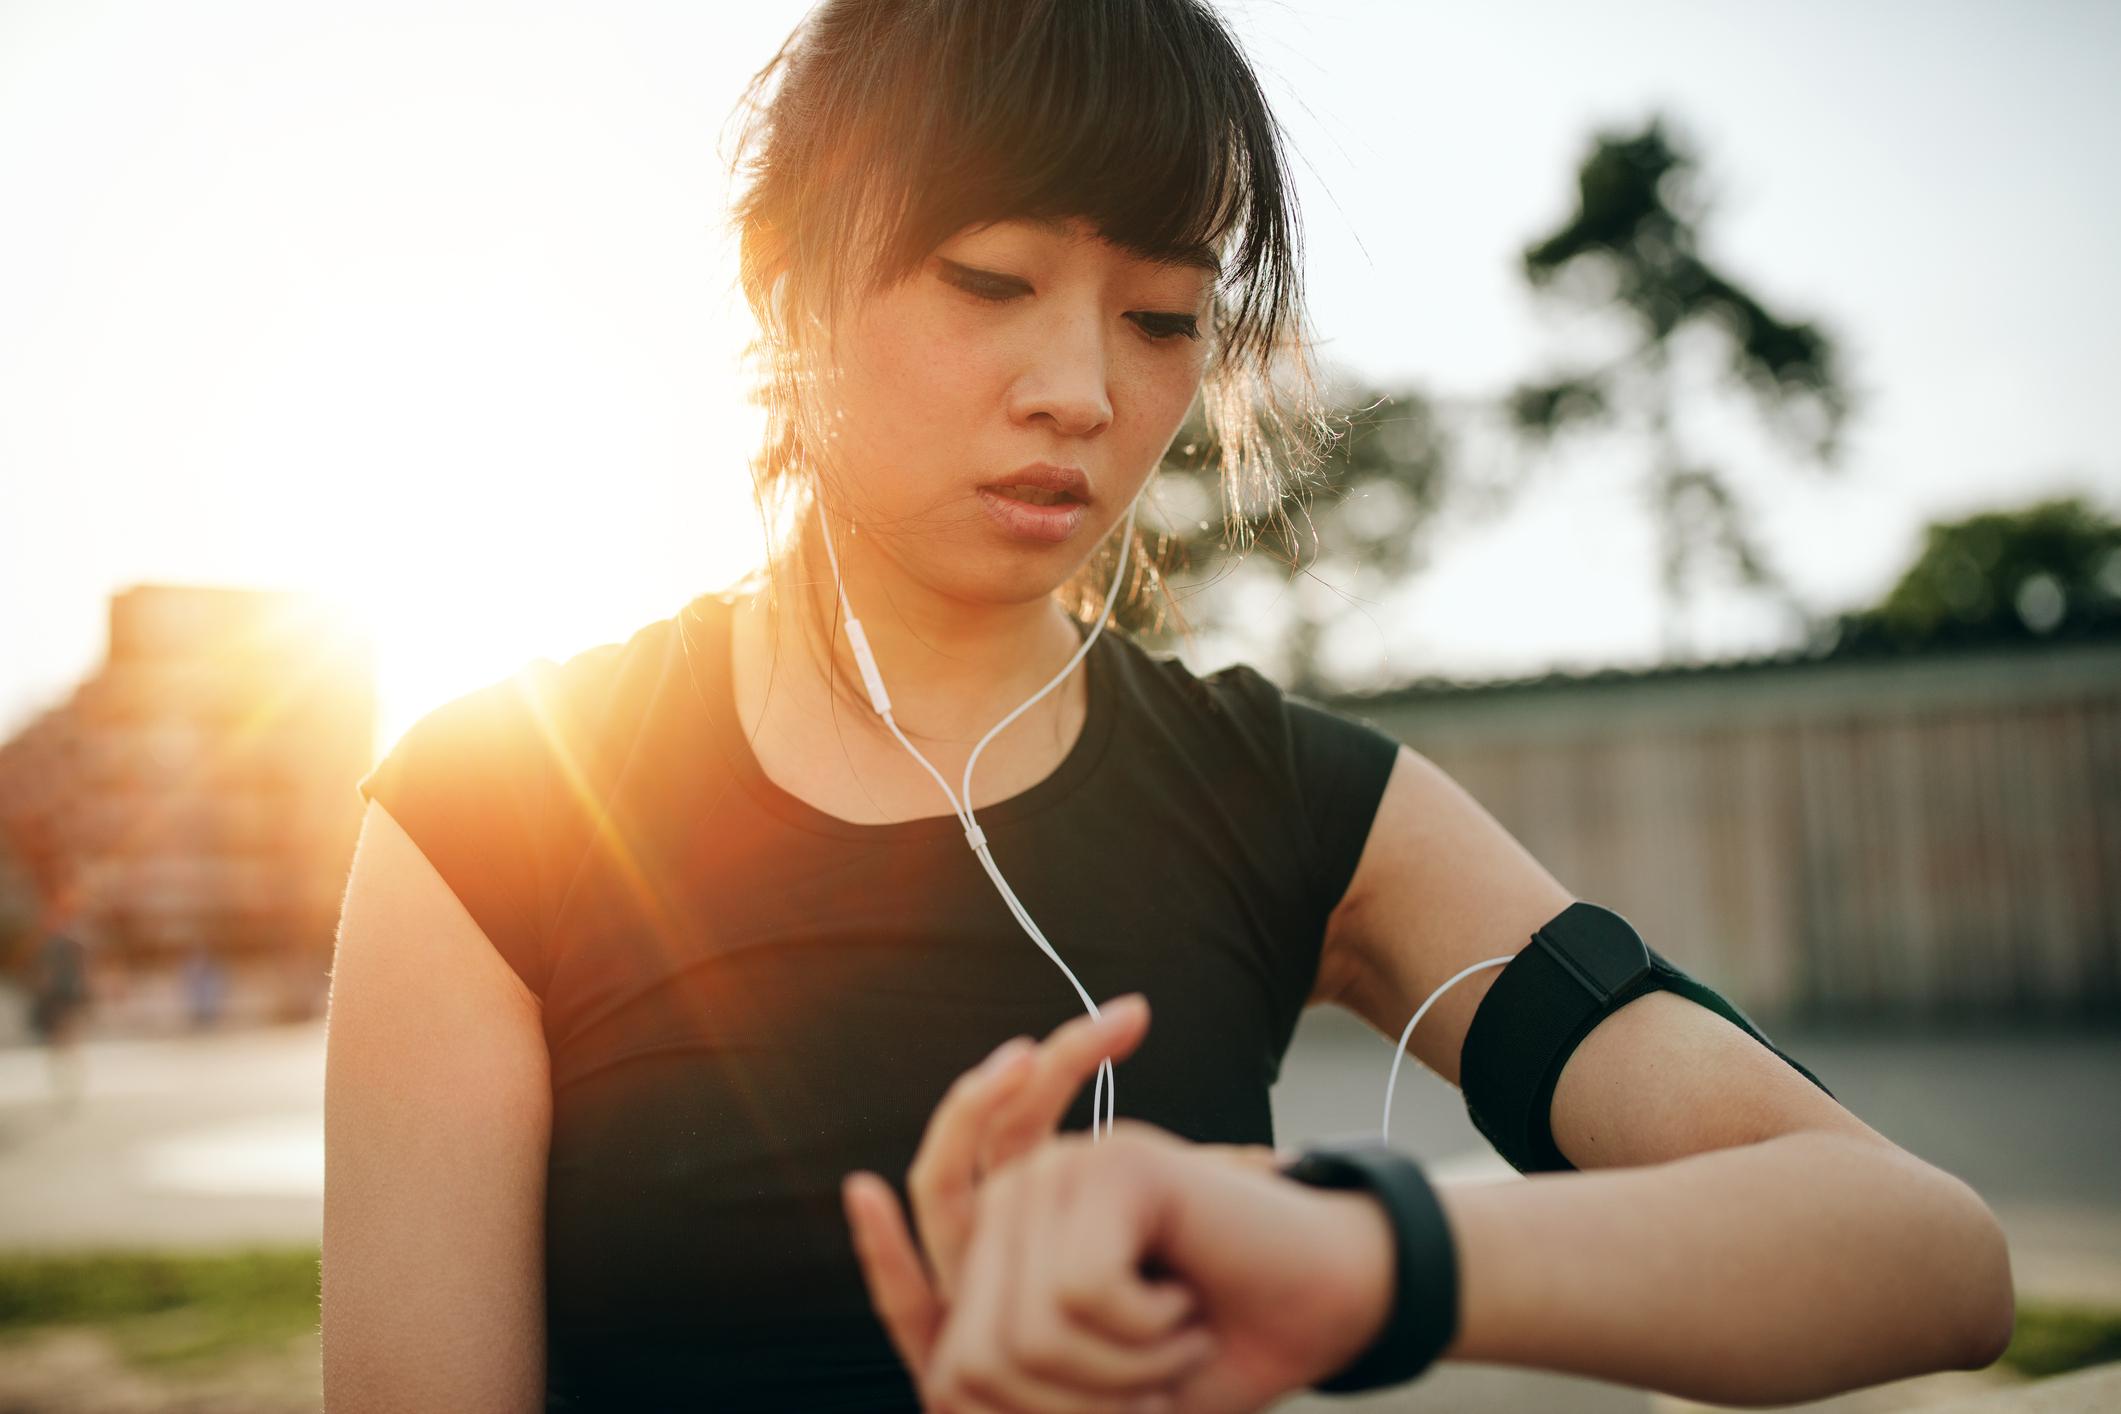 A woman checks a fitness tracker.